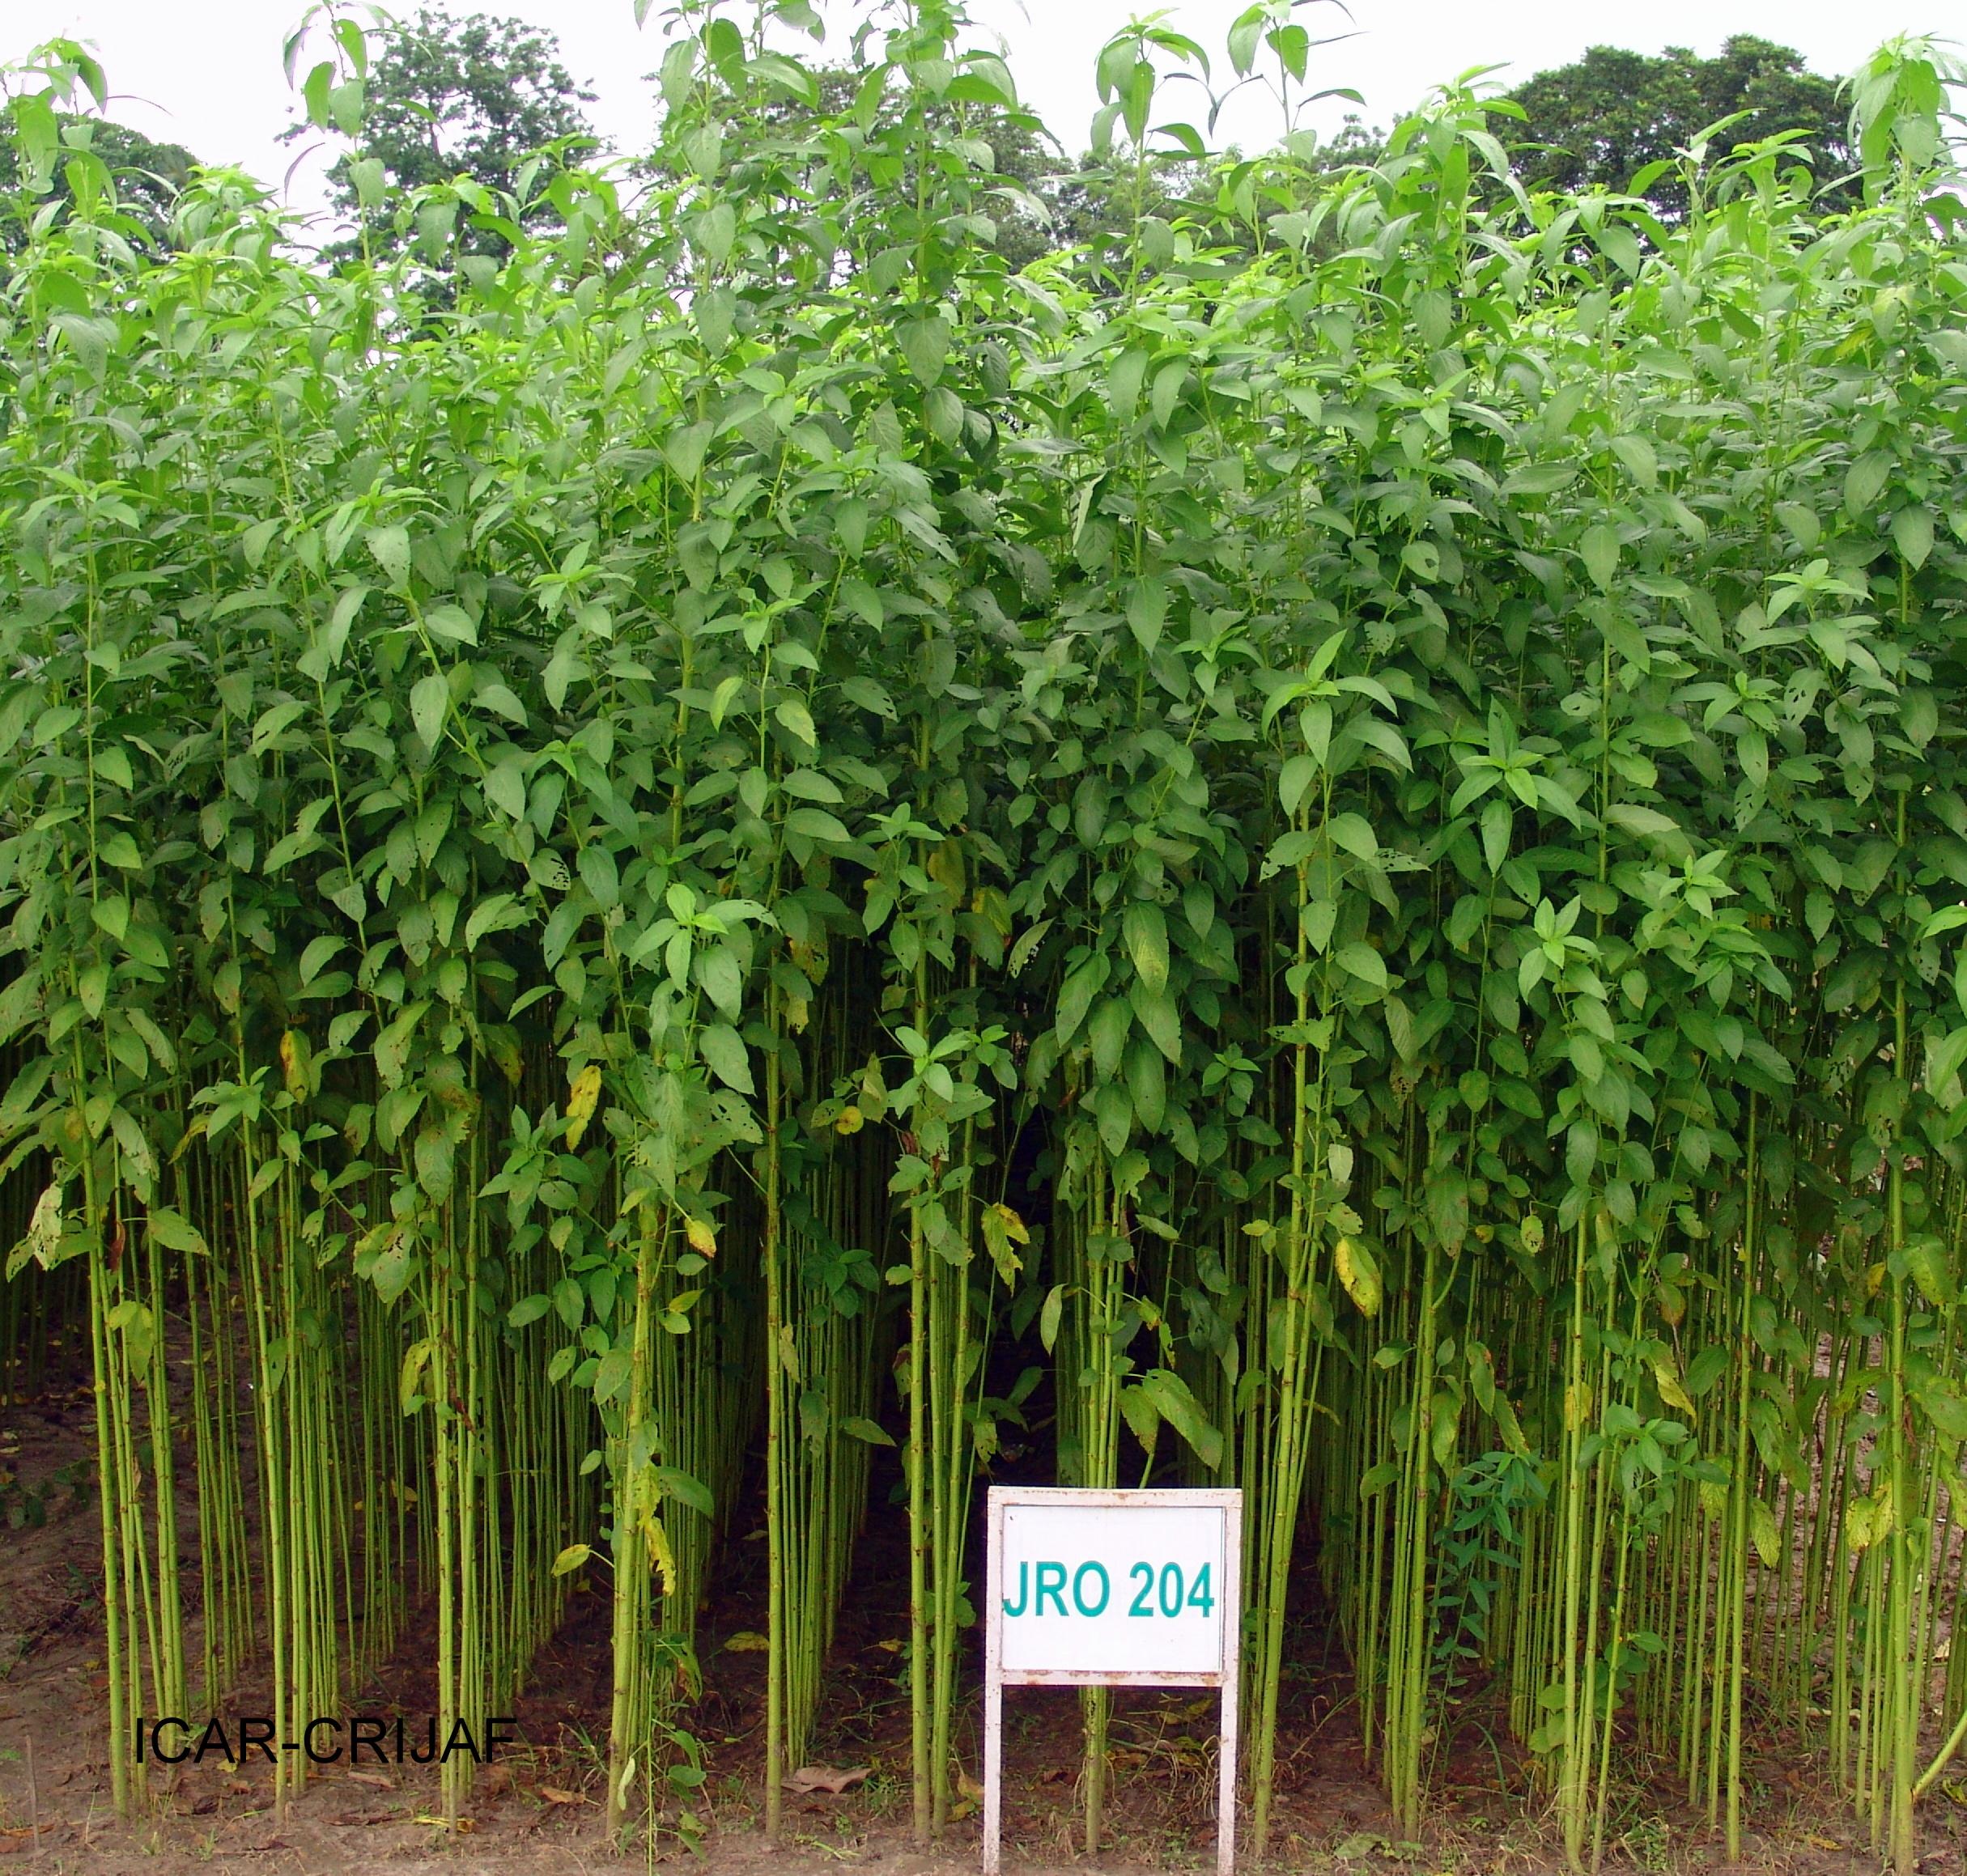 How to Start Ewedu Farming in Nigeria